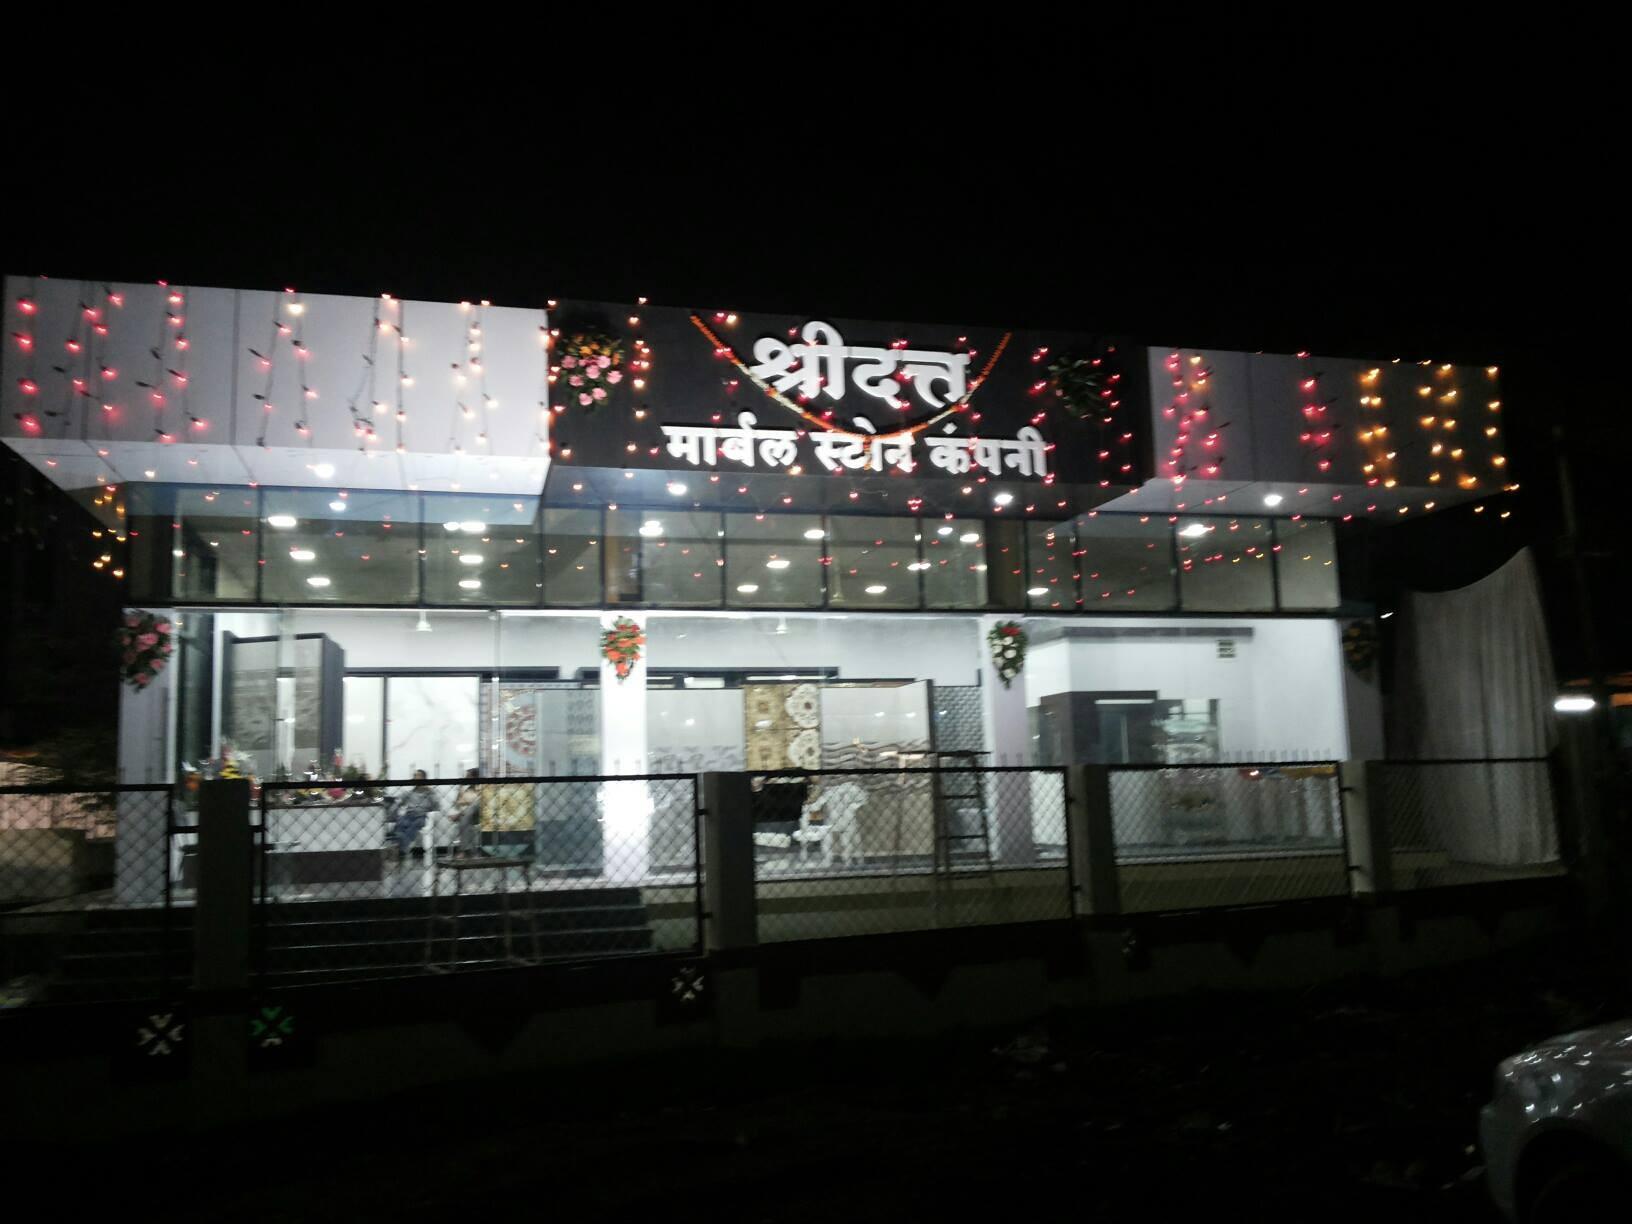 Shri Datta Marble Stone Co.